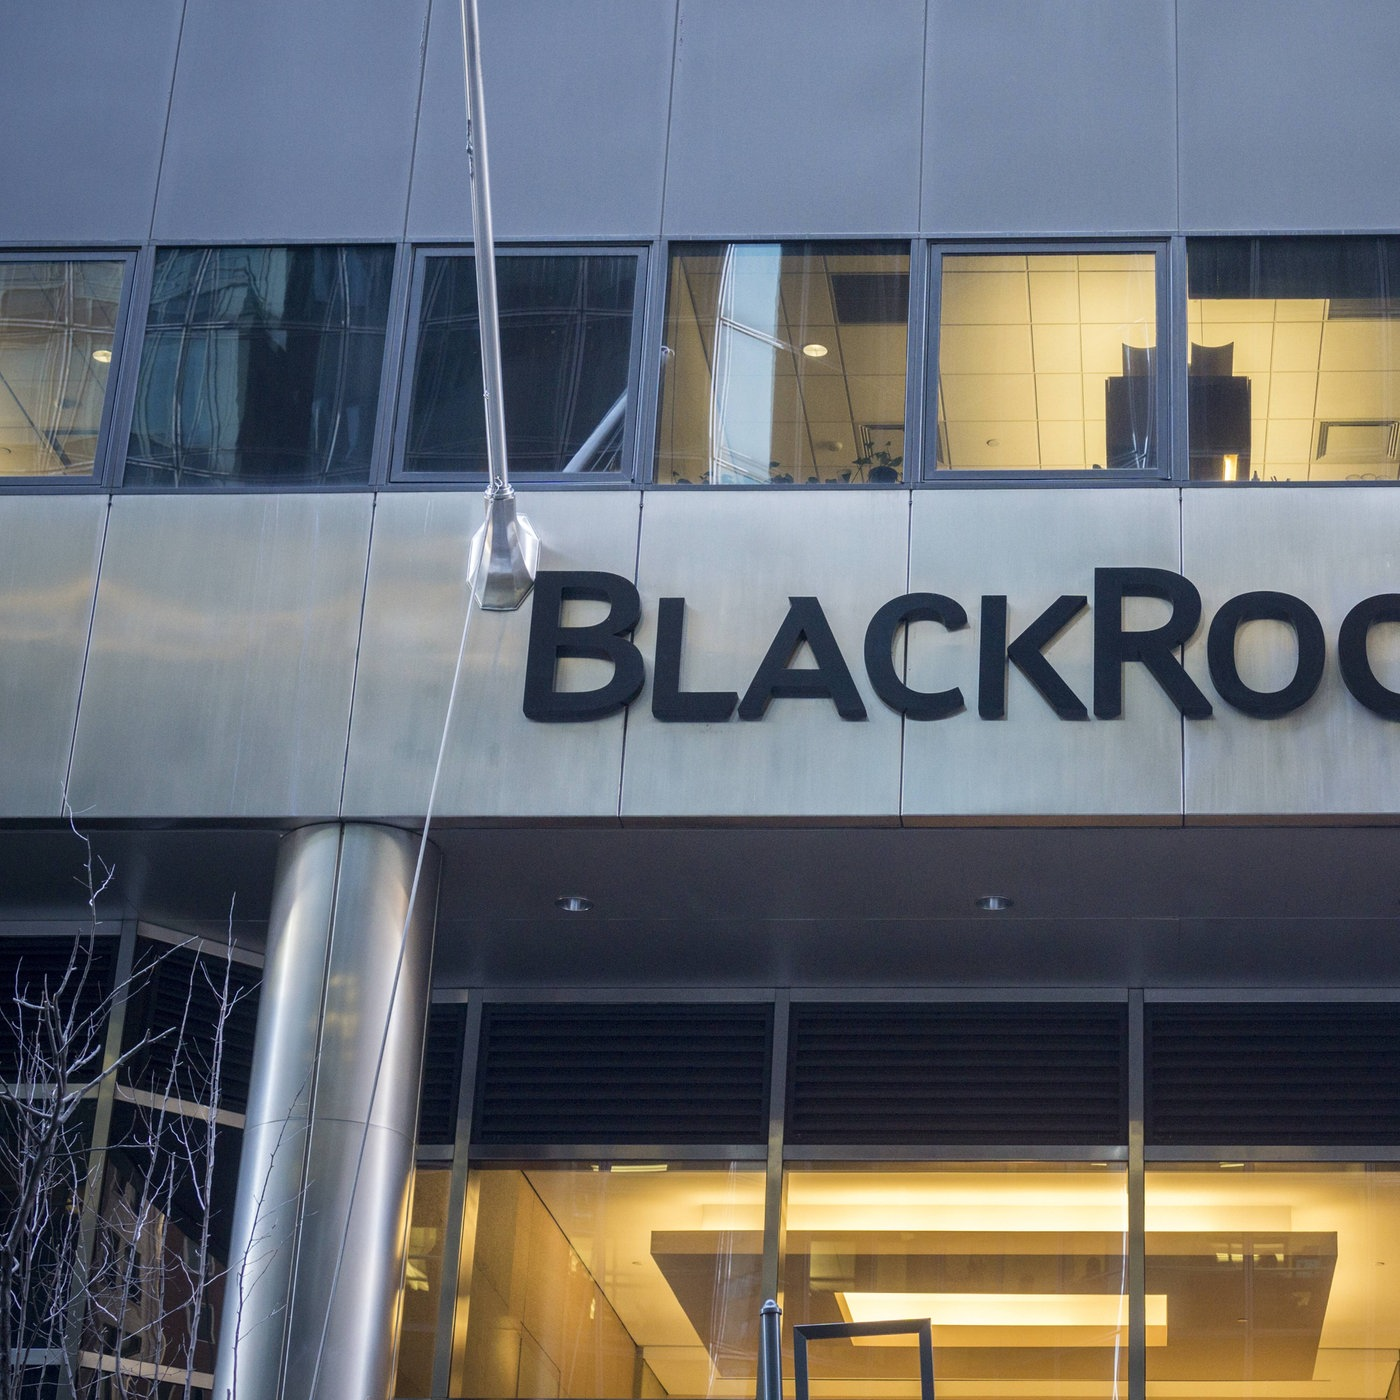 blackrock mediathek